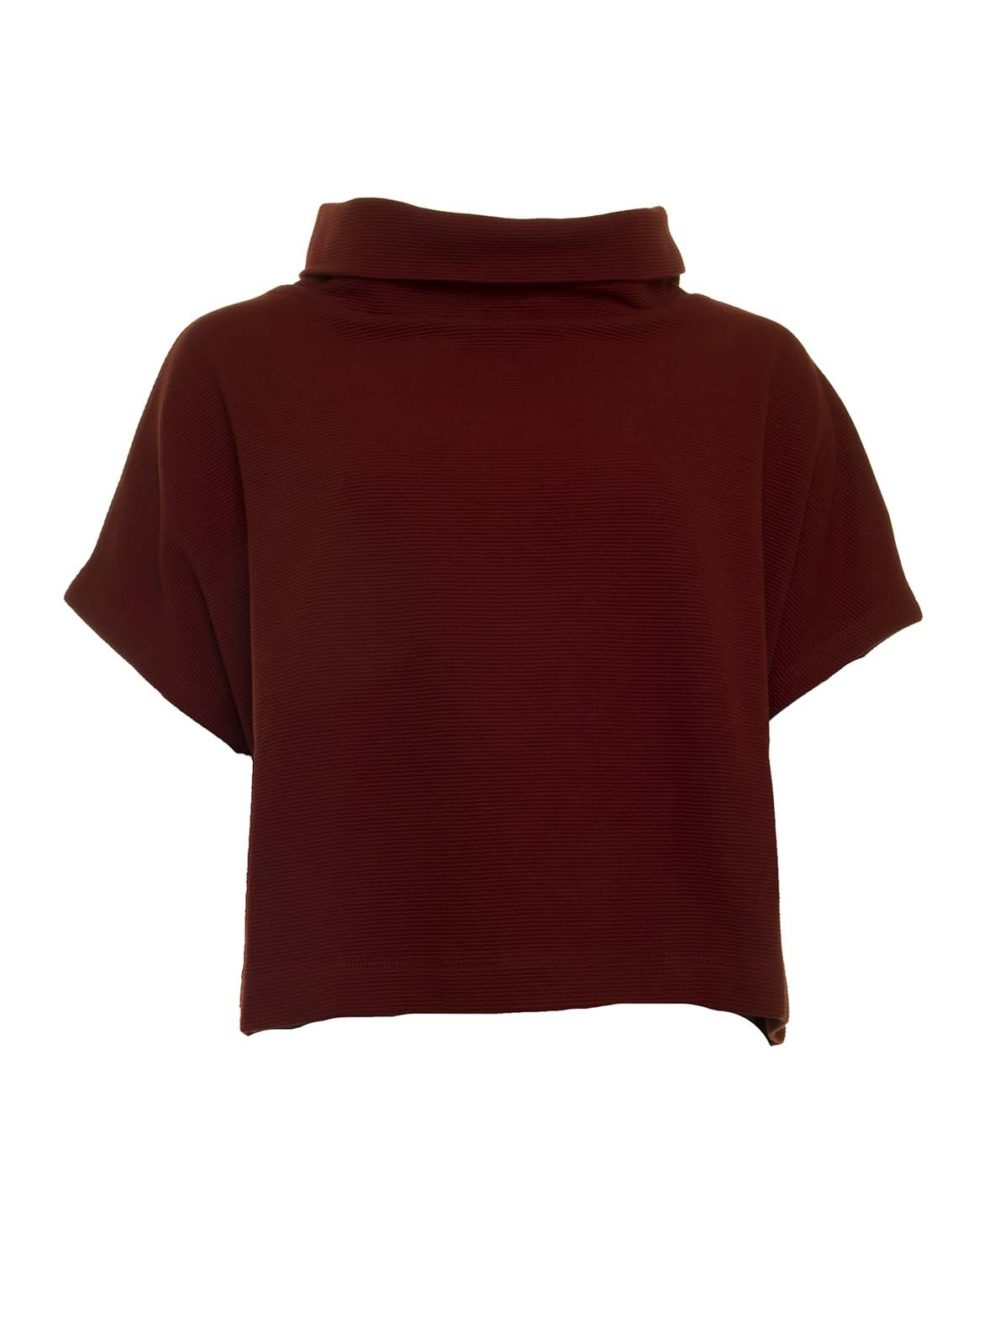 Diva Shirt Elemente Clemente Katie Kerr Women's Clothing